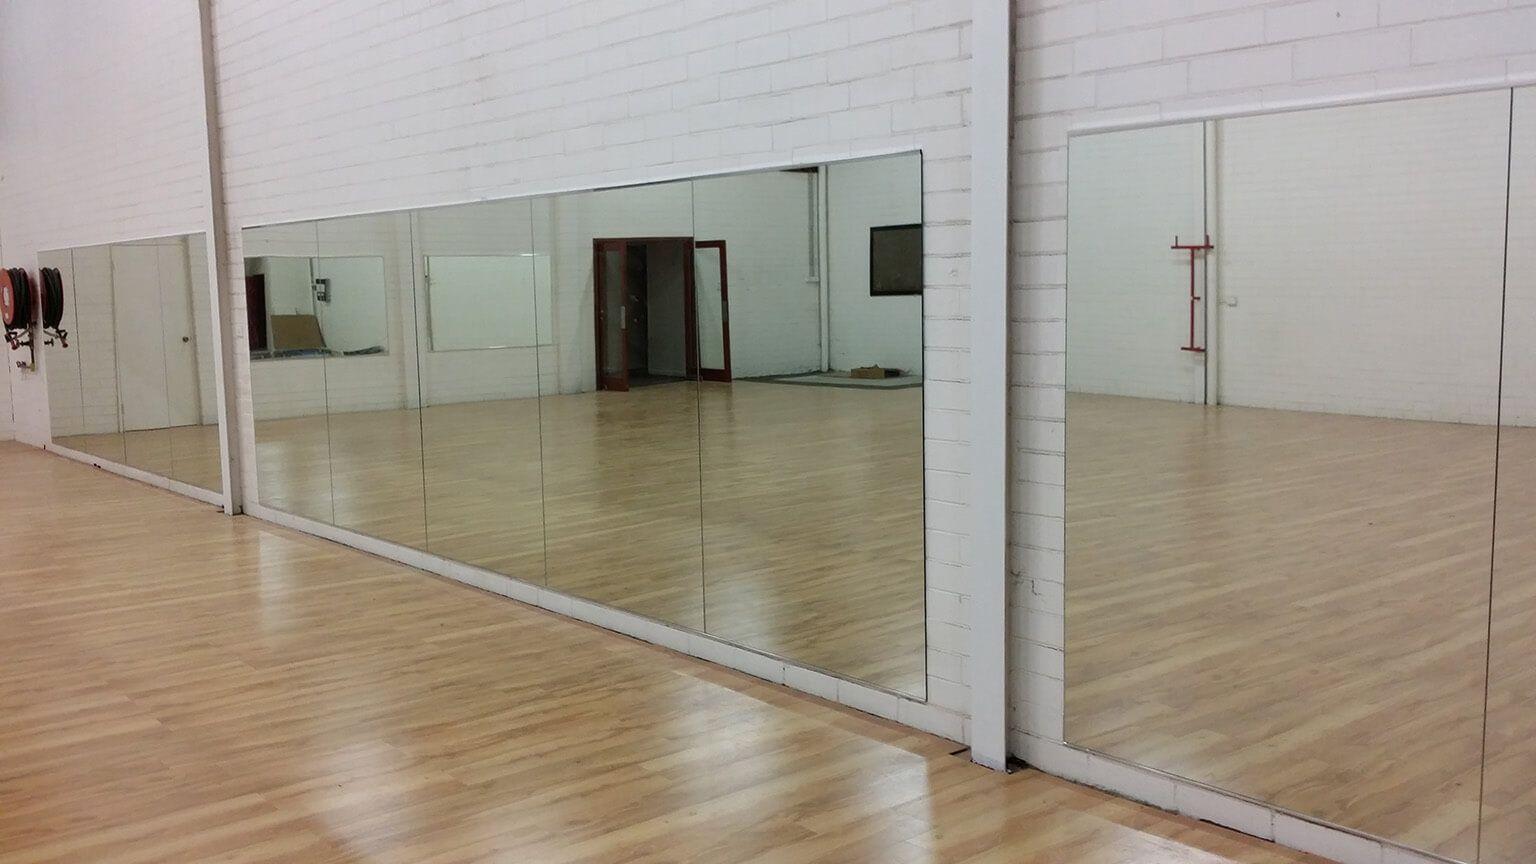 Dance studio wall mirrors drrw pinterest dance